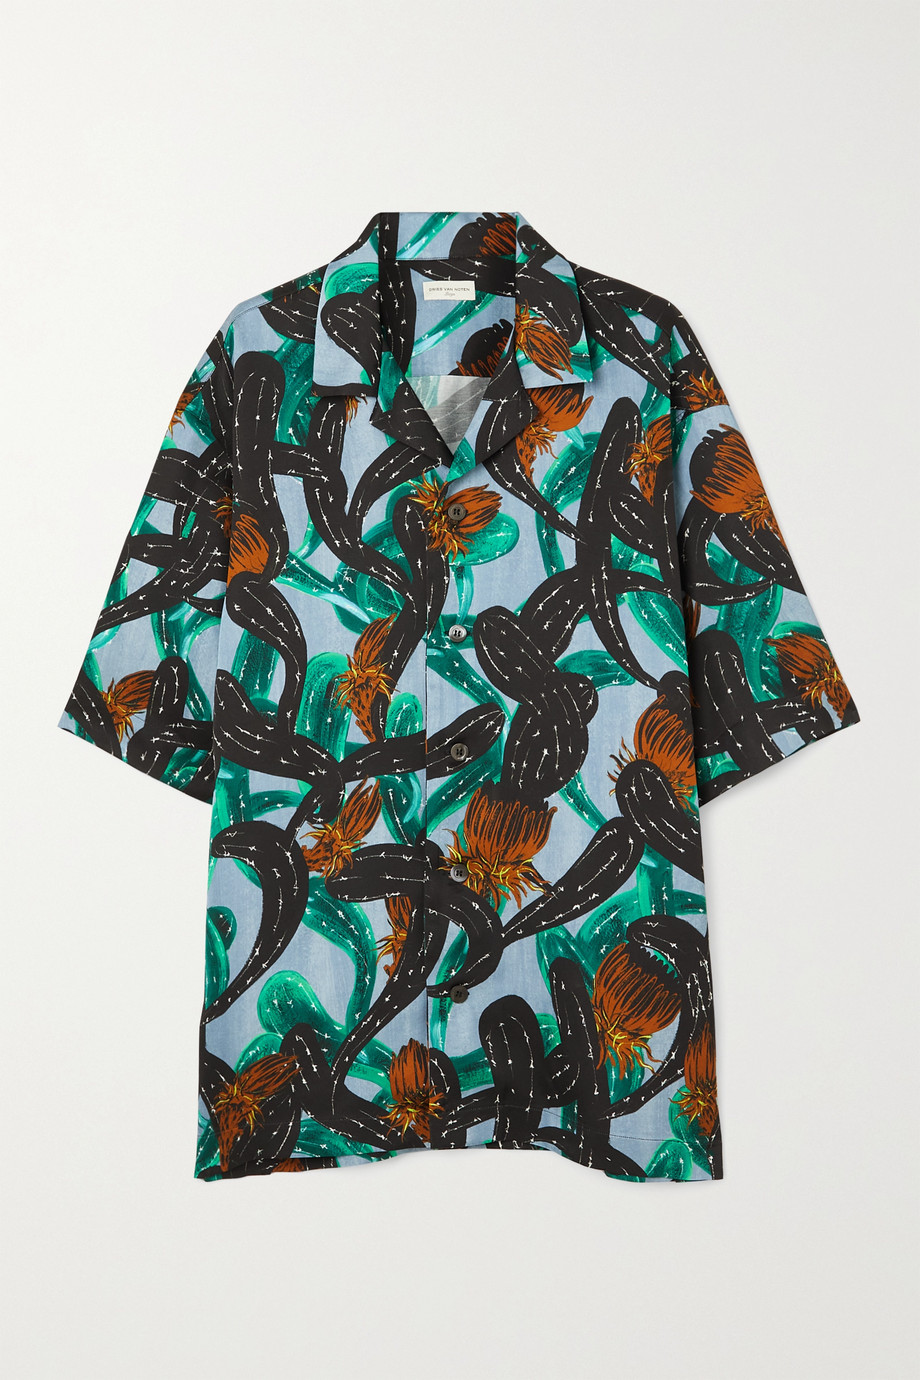 Dries Van Noten Cassie oversized printed twill shirt